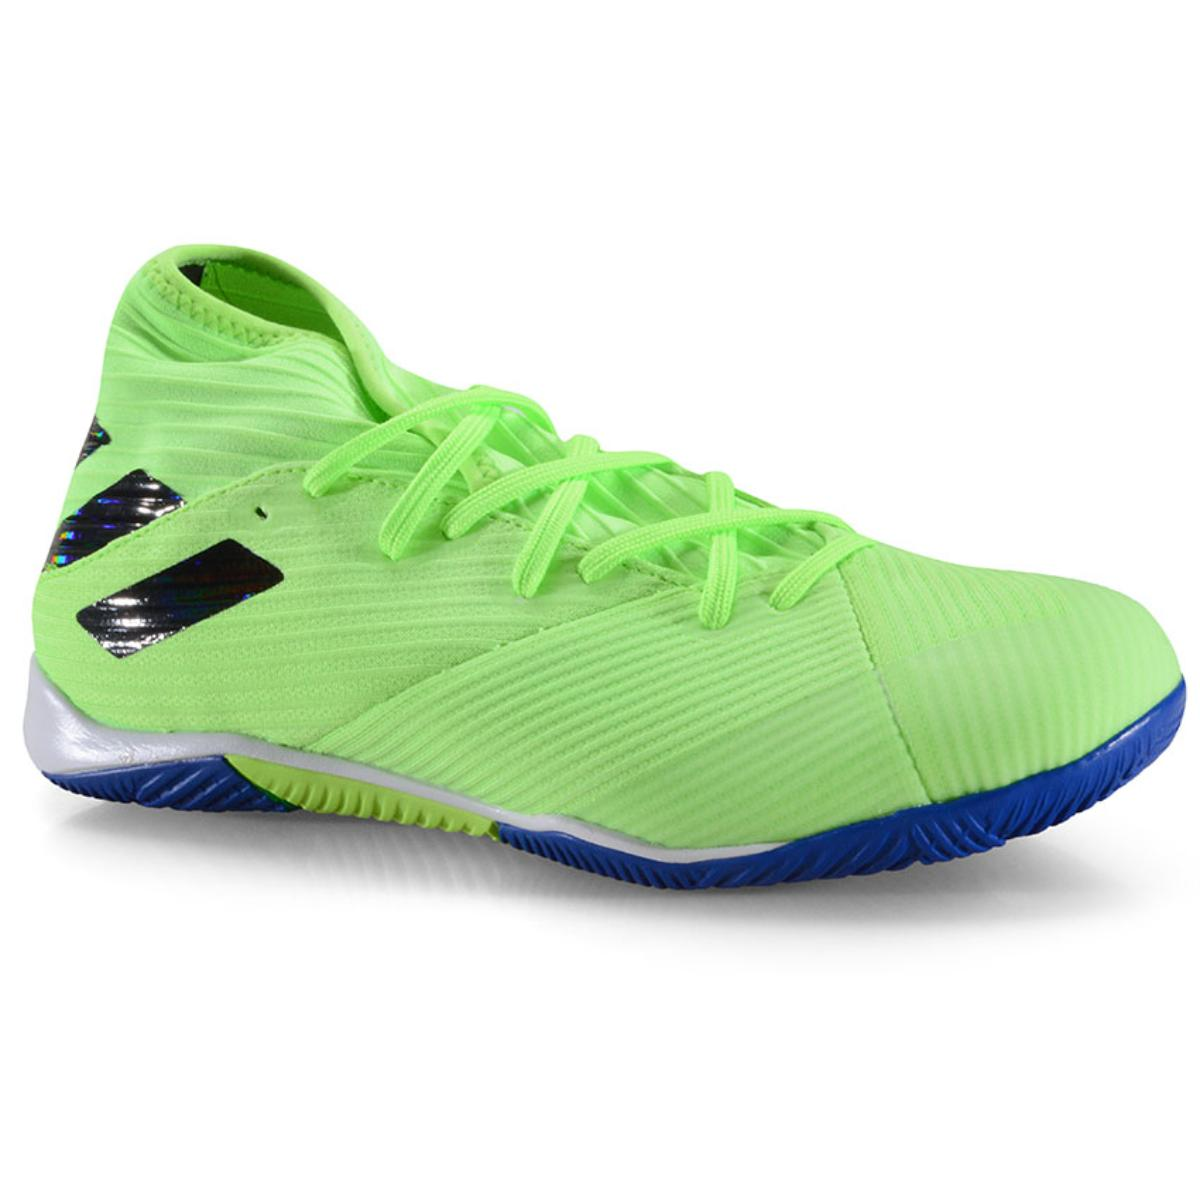 Tênis Masculino Adidas Fv3995 Nemeziz 19.3 in Verde Neon